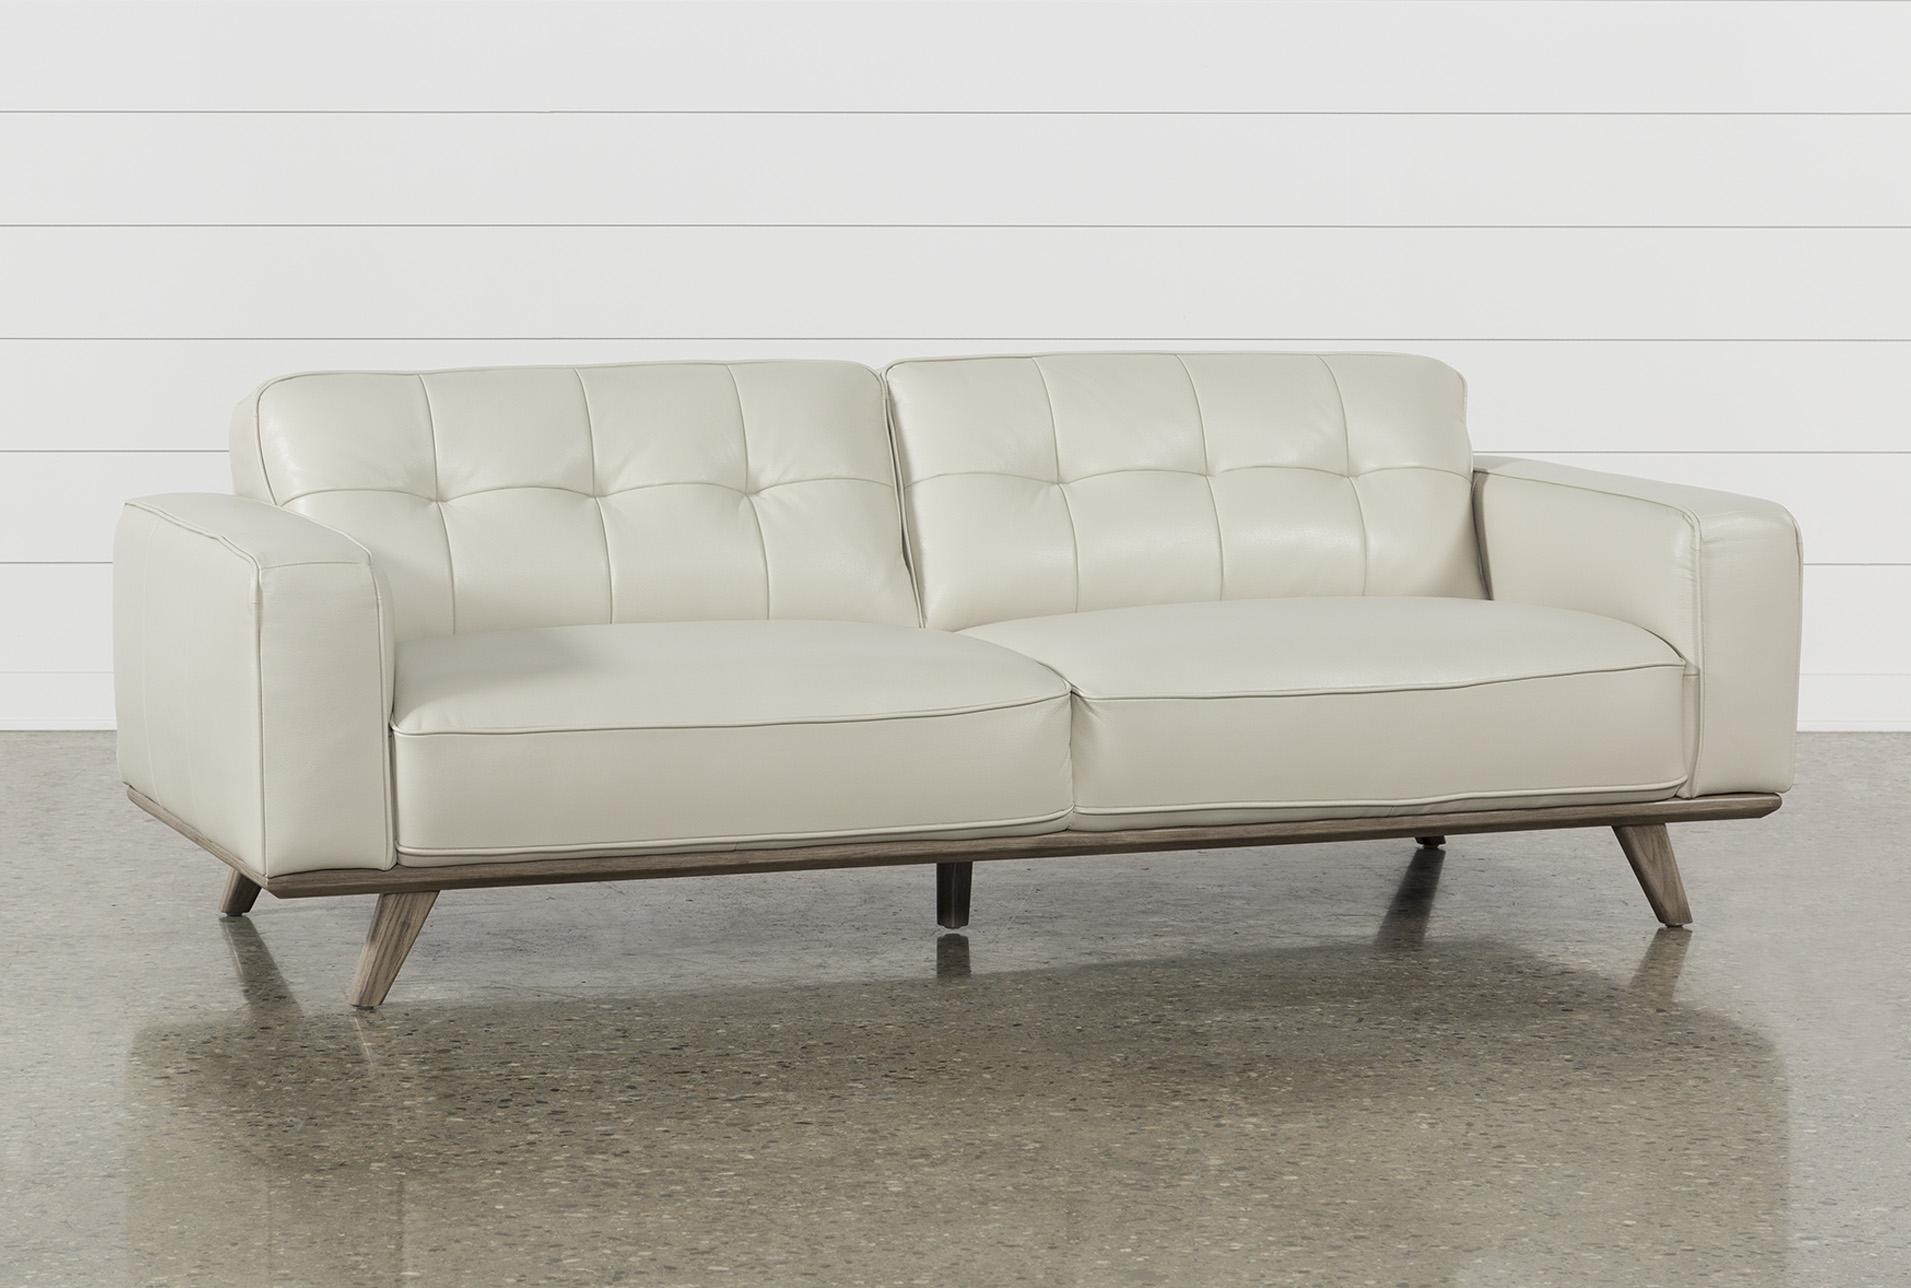 Caressa Leather Dove Grey Sofa | Living Spaces